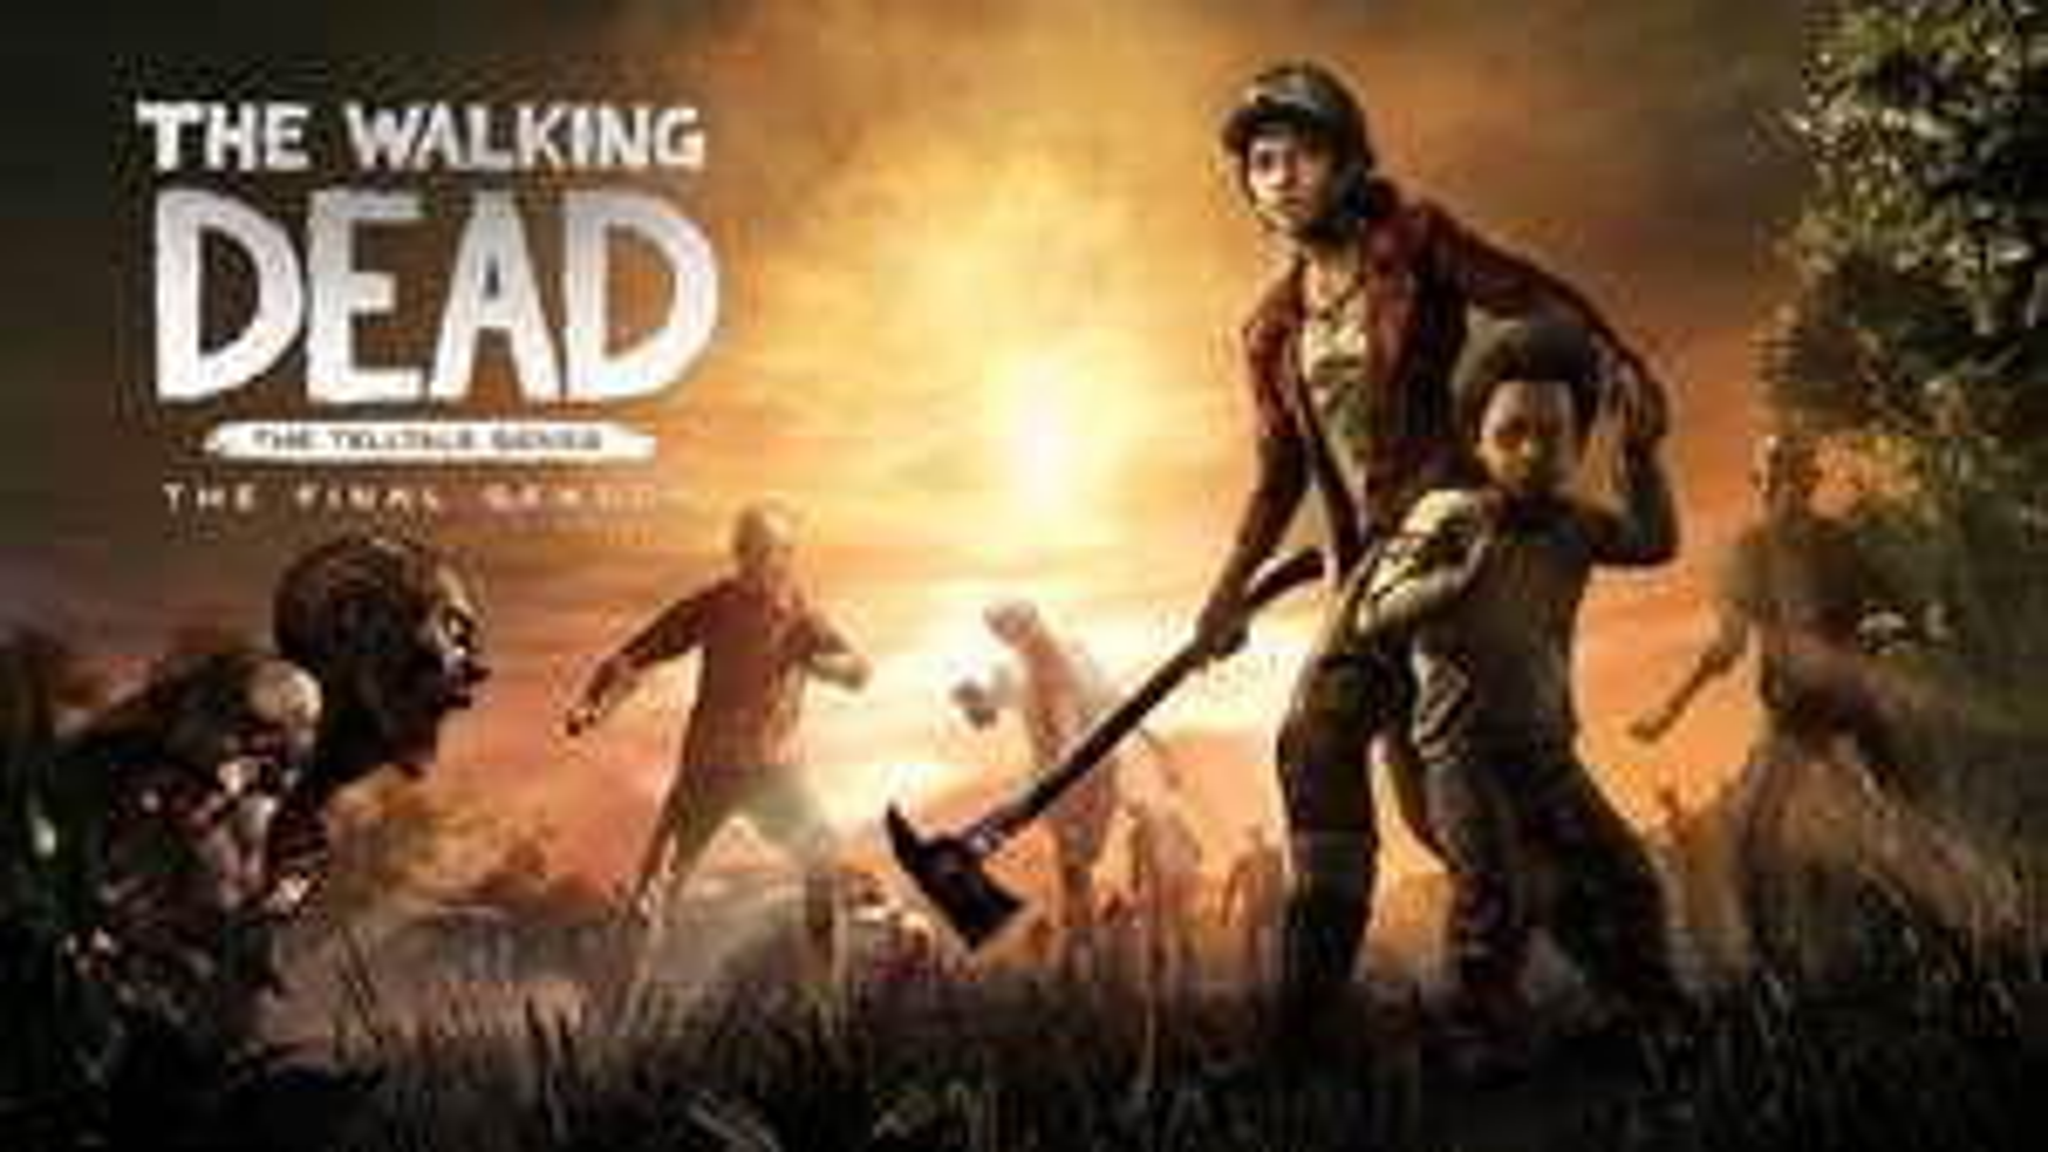 The Walking Dead - The Telltale Series - Komplette Sammlung - Alle Staffeln 1-4 + Bonus-Episoden + 6 Avatare [PSN + Xbox]